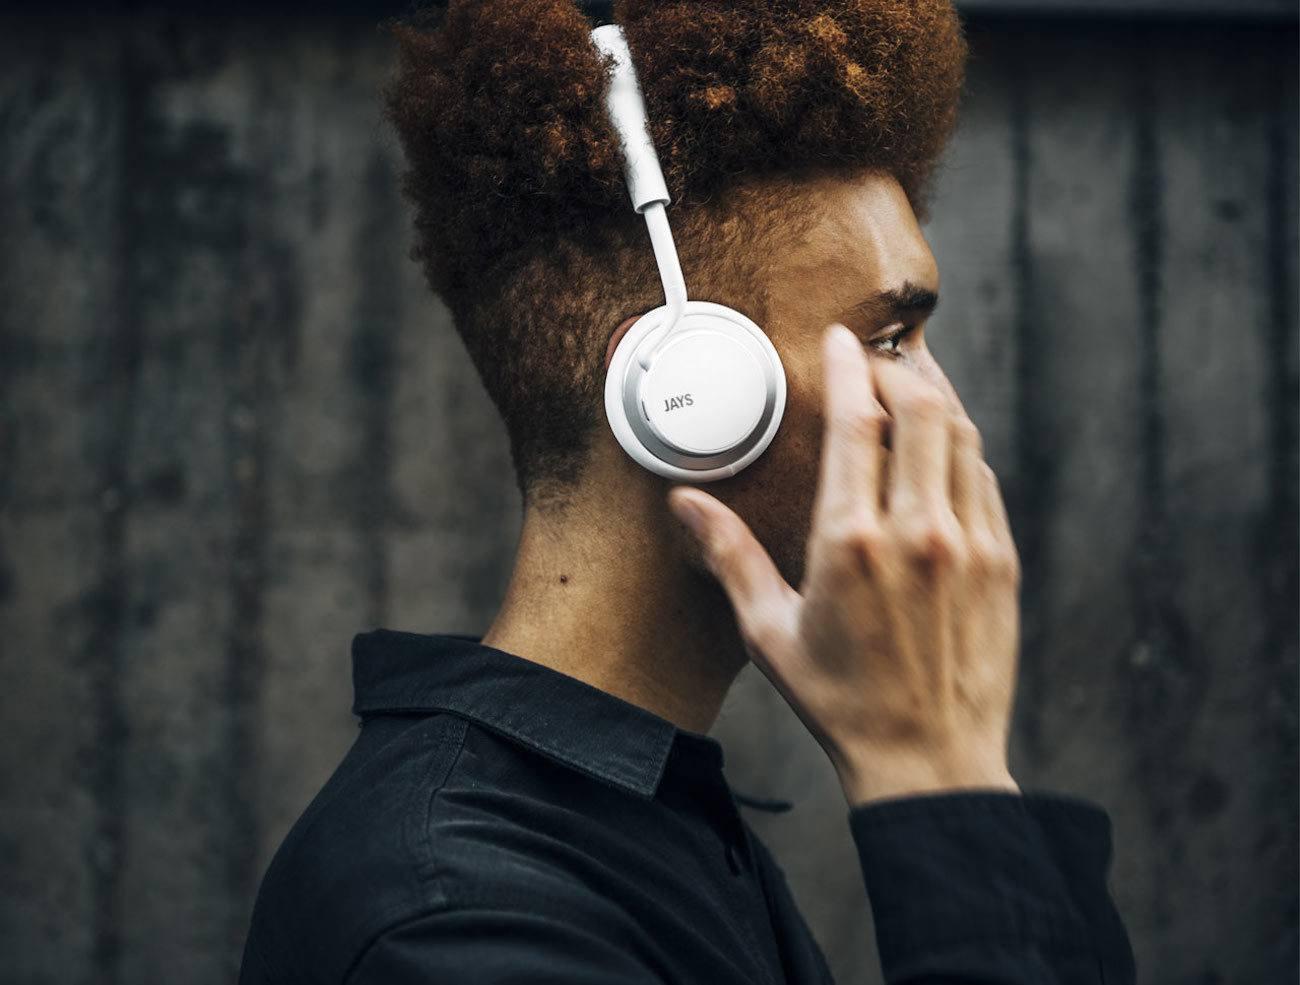 u-JAYS Smart Wireless Headphones